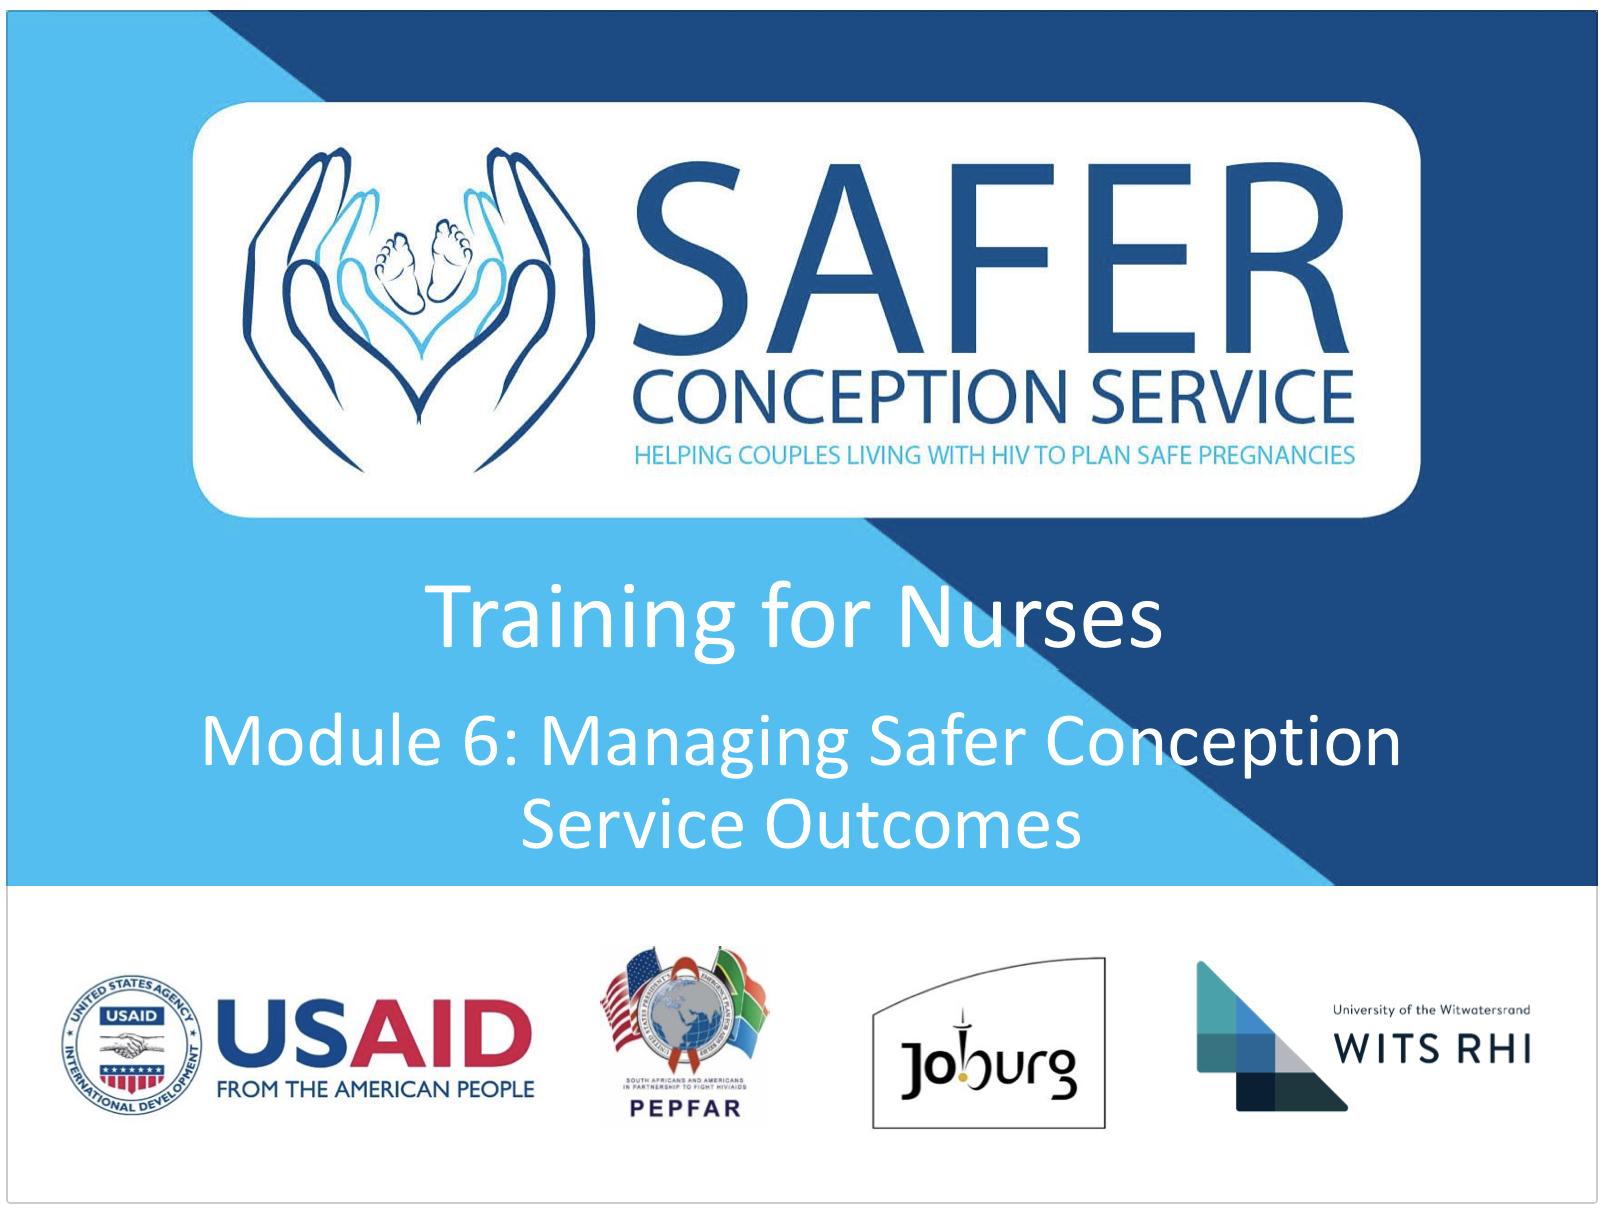 Nurses Training Resources